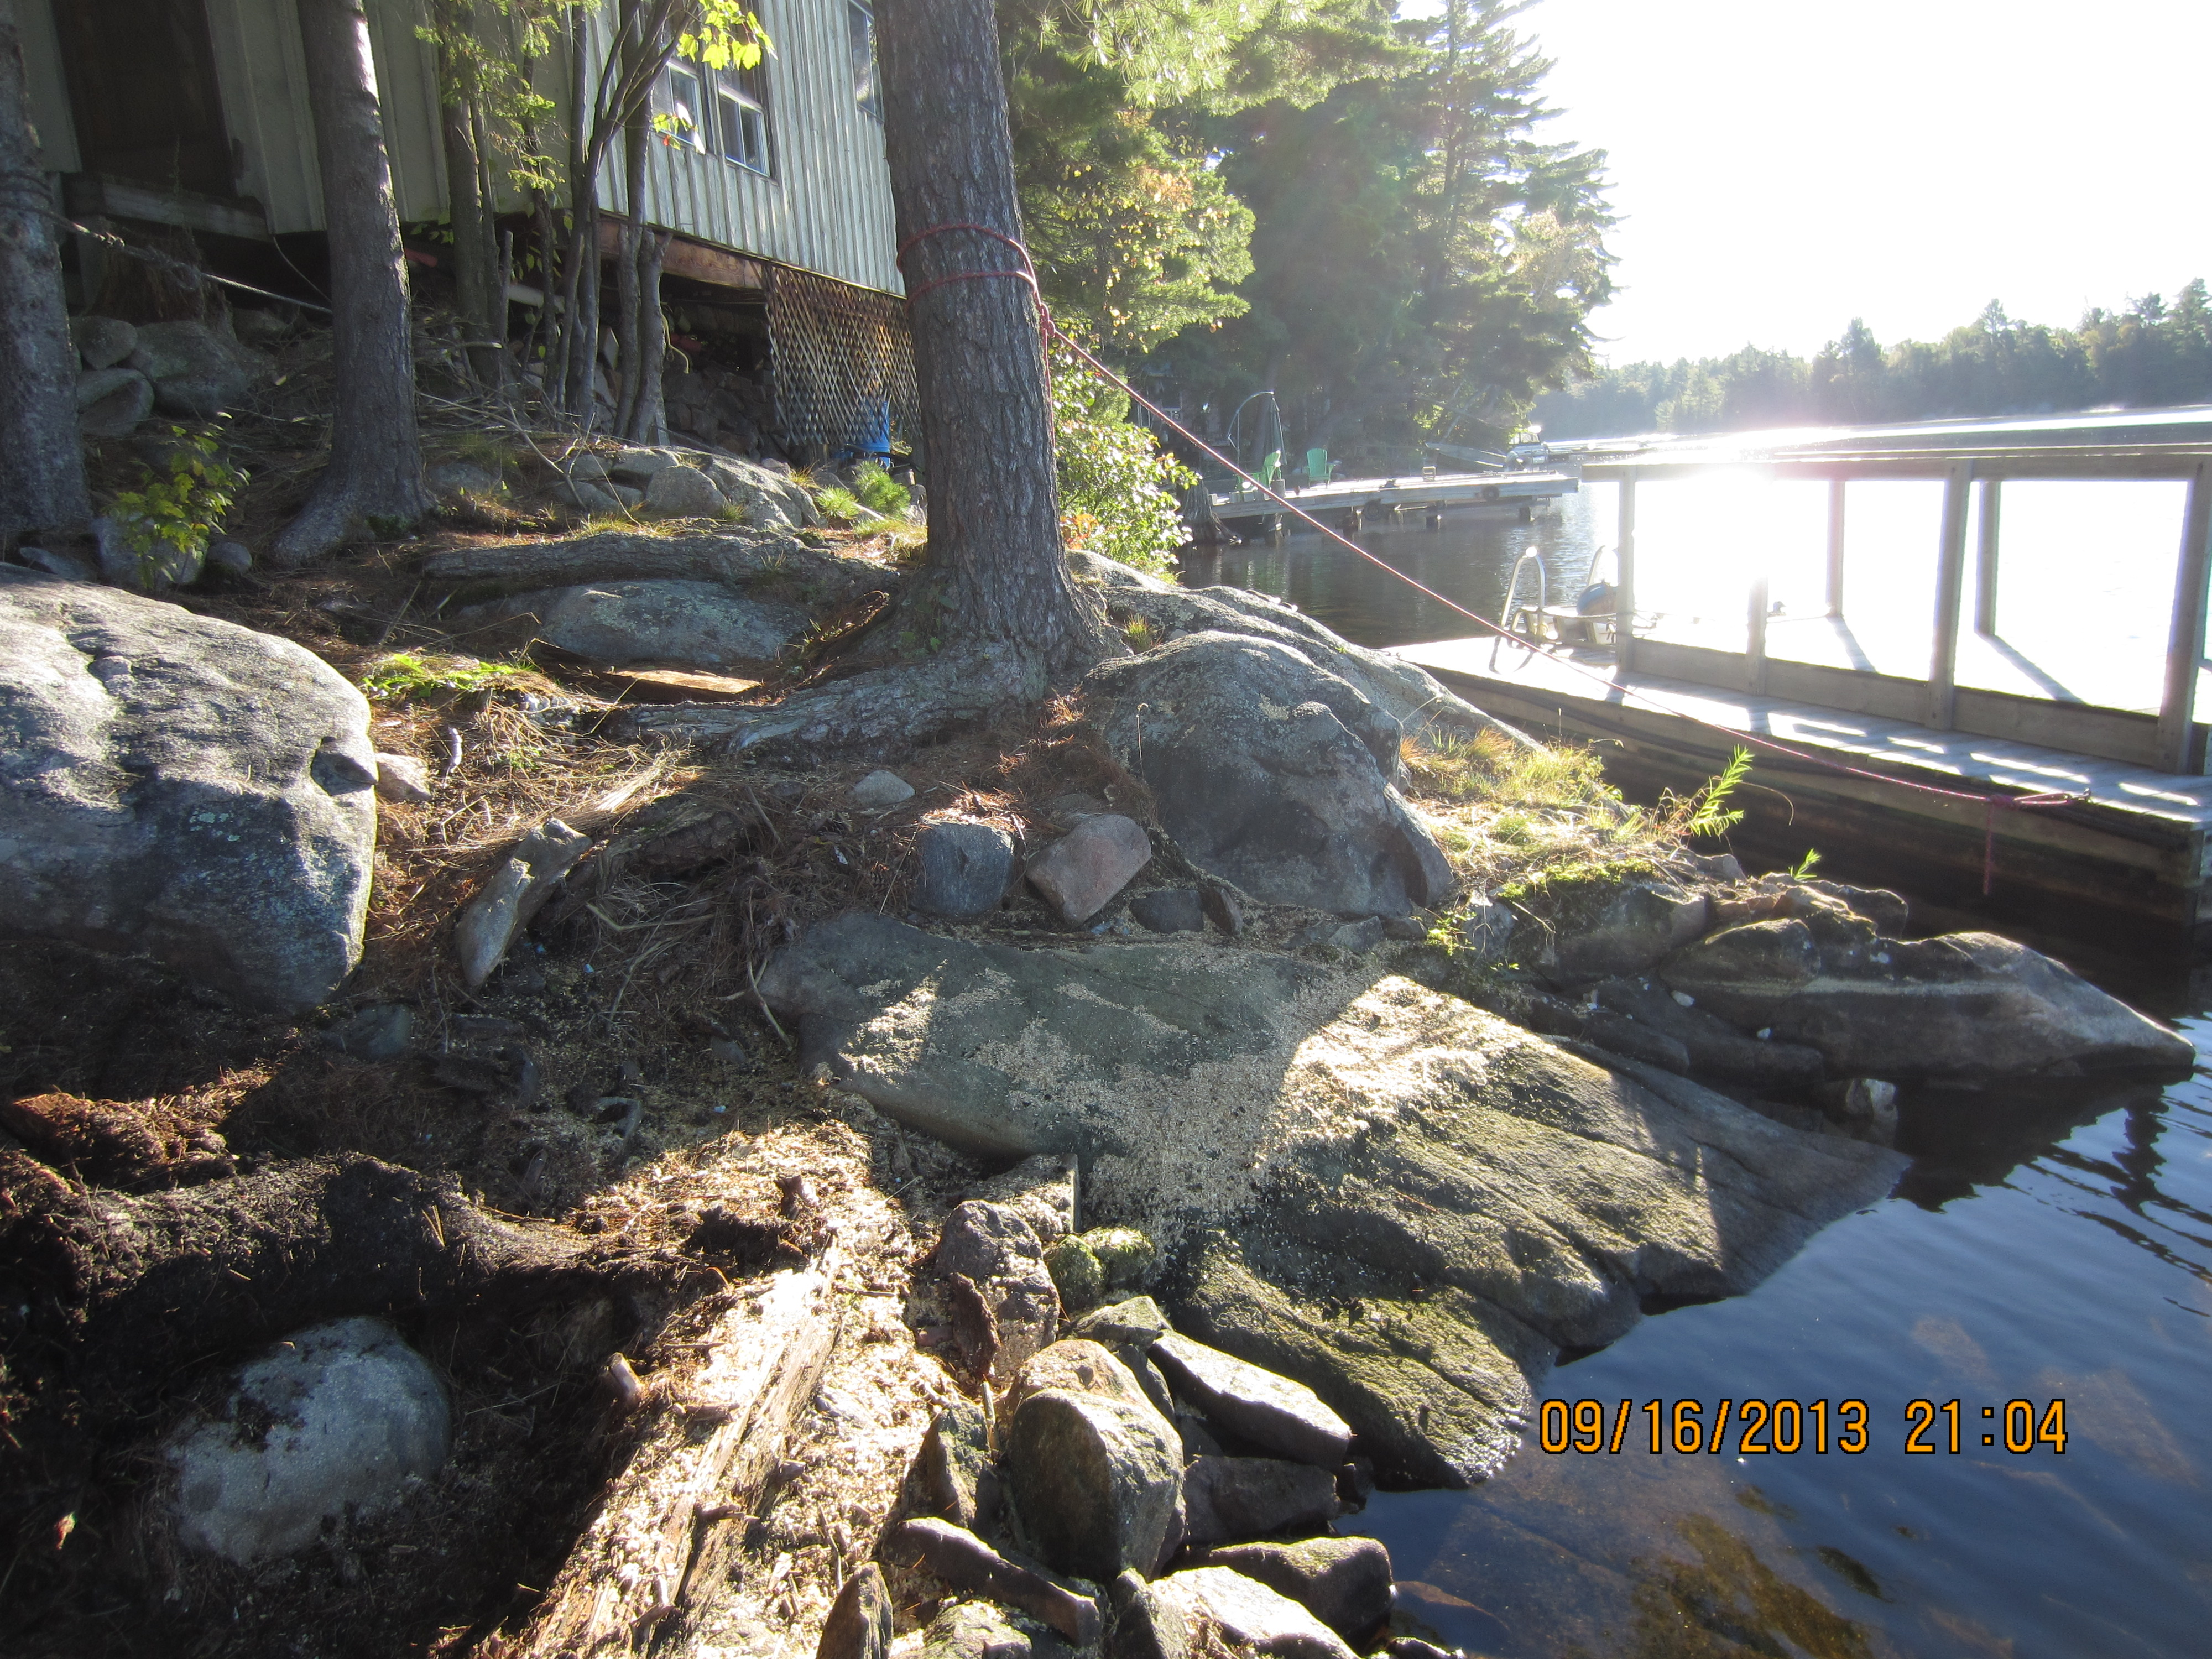 Unuseable Rocky Shoreline